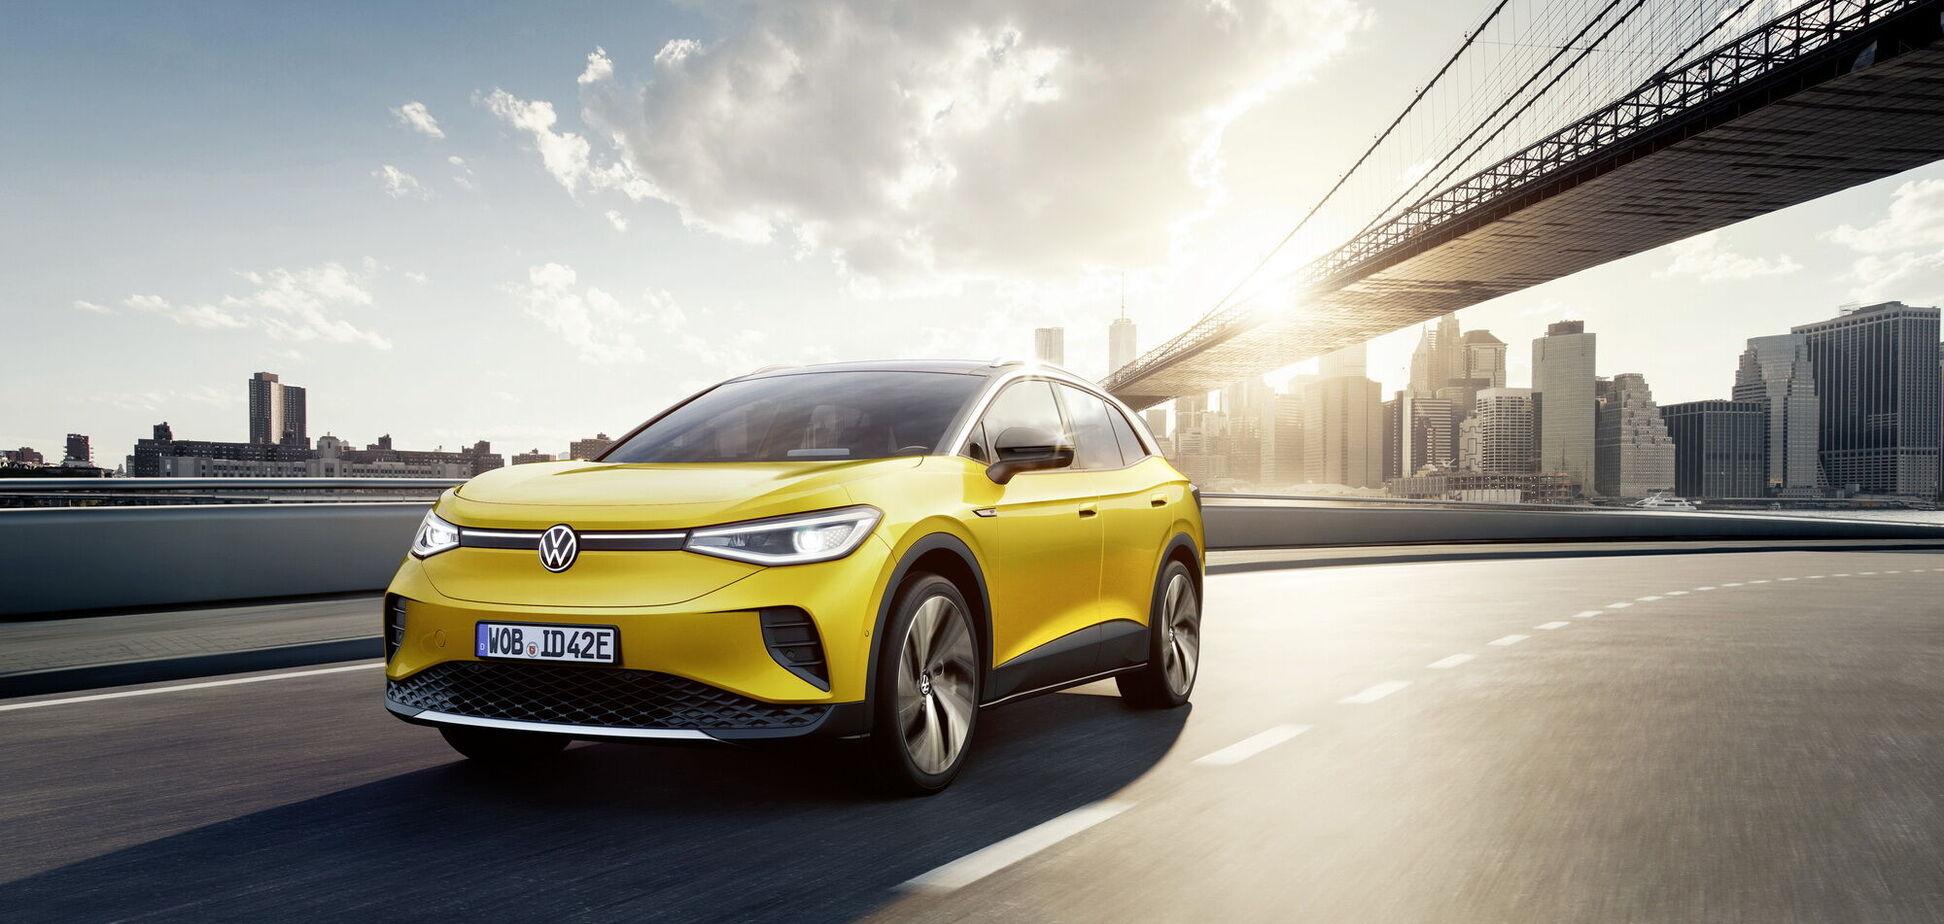 Volkswagen переименует свои электромобили в Voltswagen